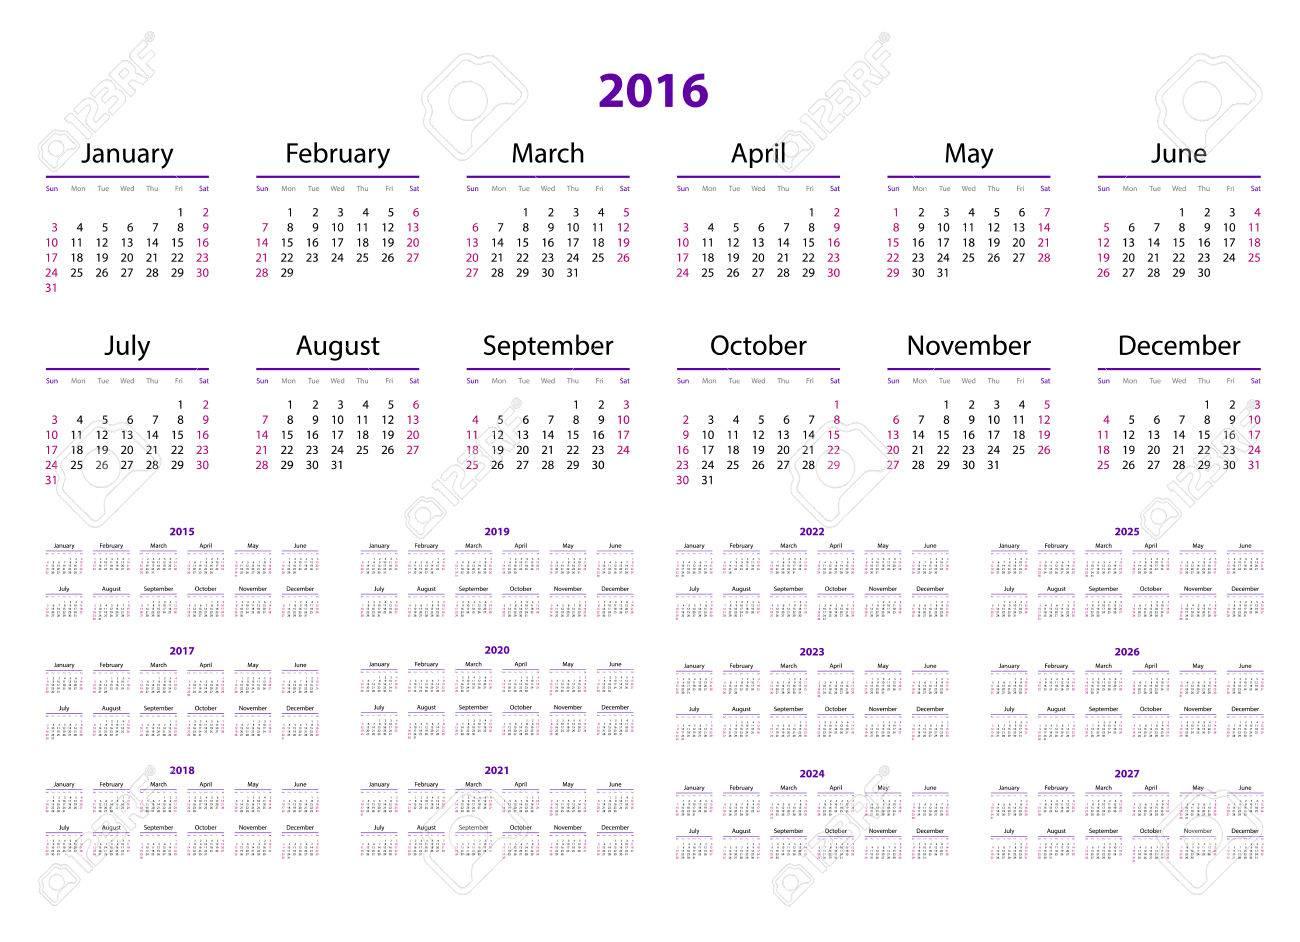 Calendrier 2017 2021 2022 Calendrier 2015, 2016, 2017, 2018, 2019, 2020, 2021, 2022, 2023